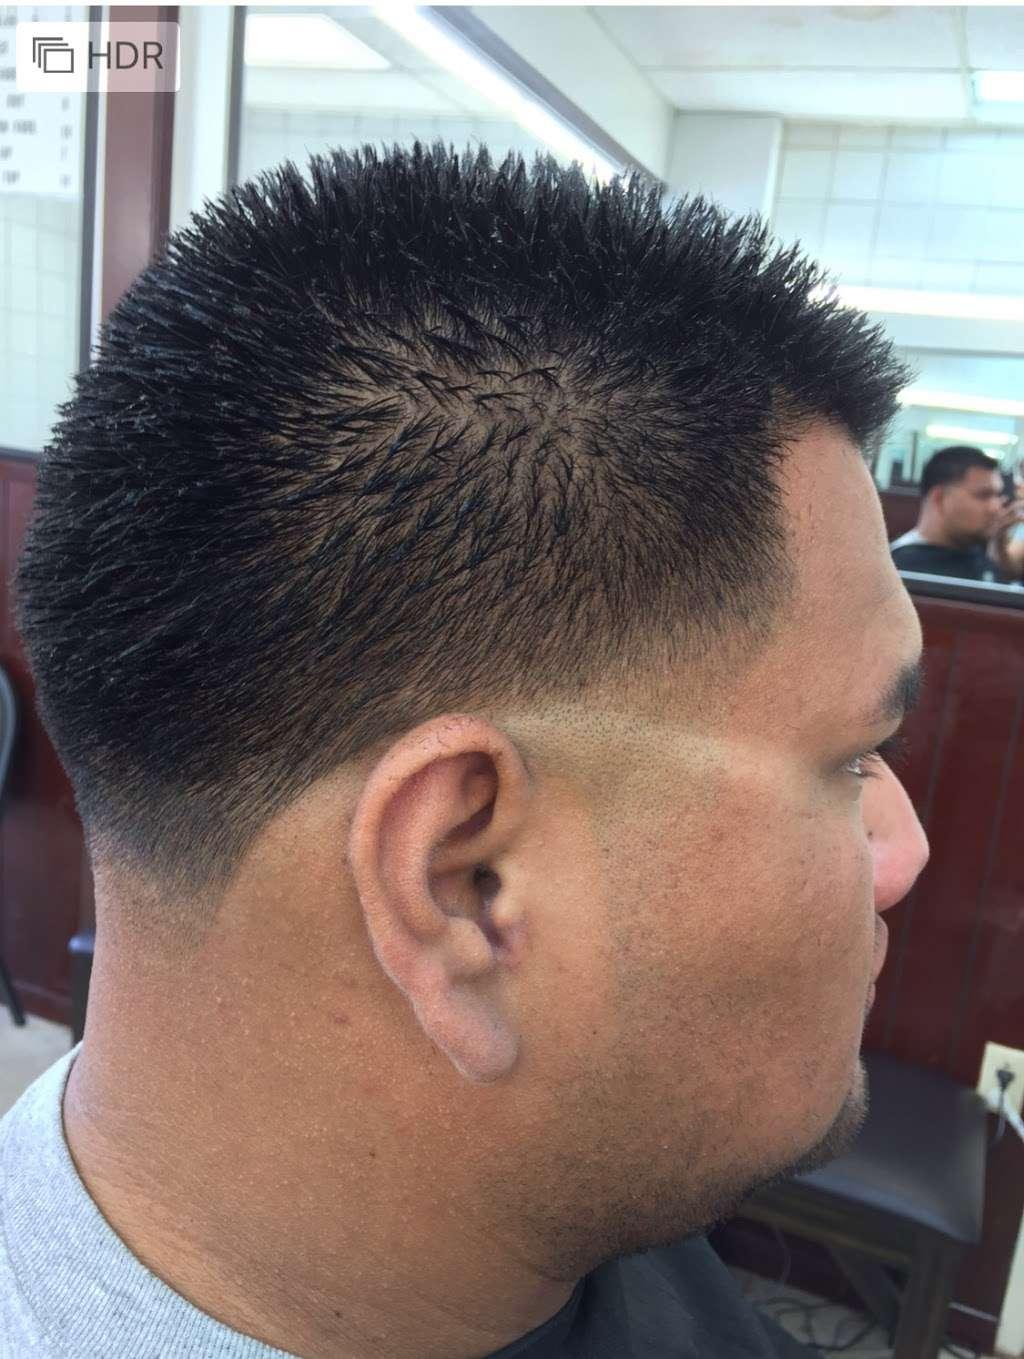 La Mesa Barber Shop - hair care  | Photo 10 of 10 | Address: 8515 La Mesa Blvd, La Mesa, CA 91942, USA | Phone: (619) 908-9557